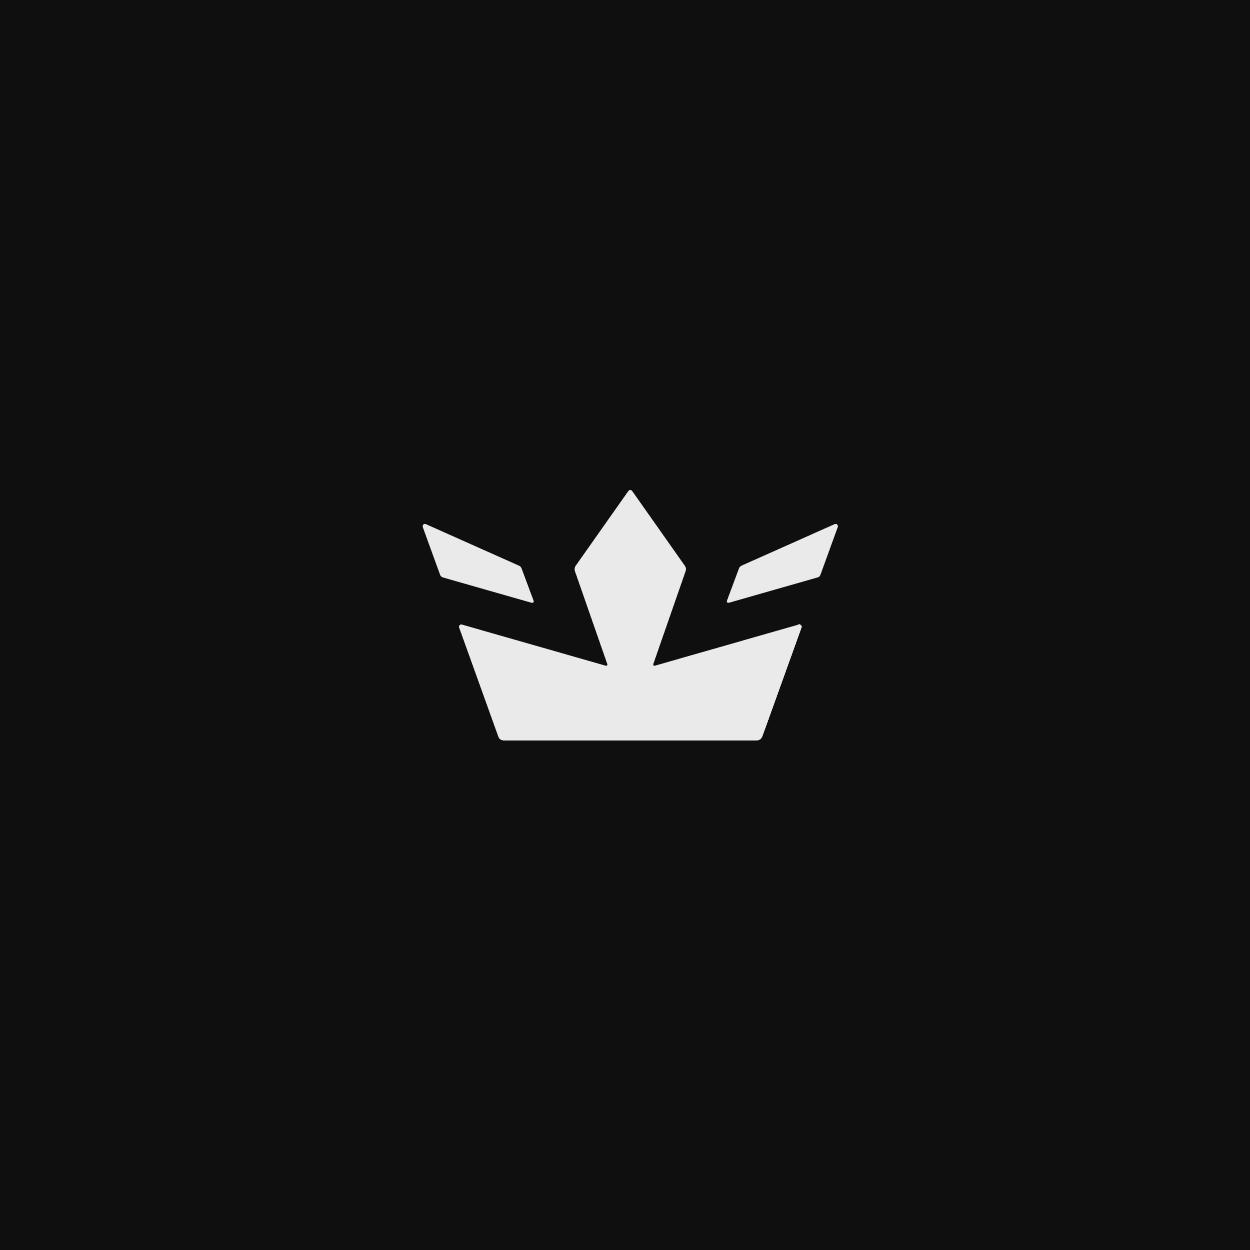 Sylvan_Logofolio2019_Artboard 128 copy1250.jpg